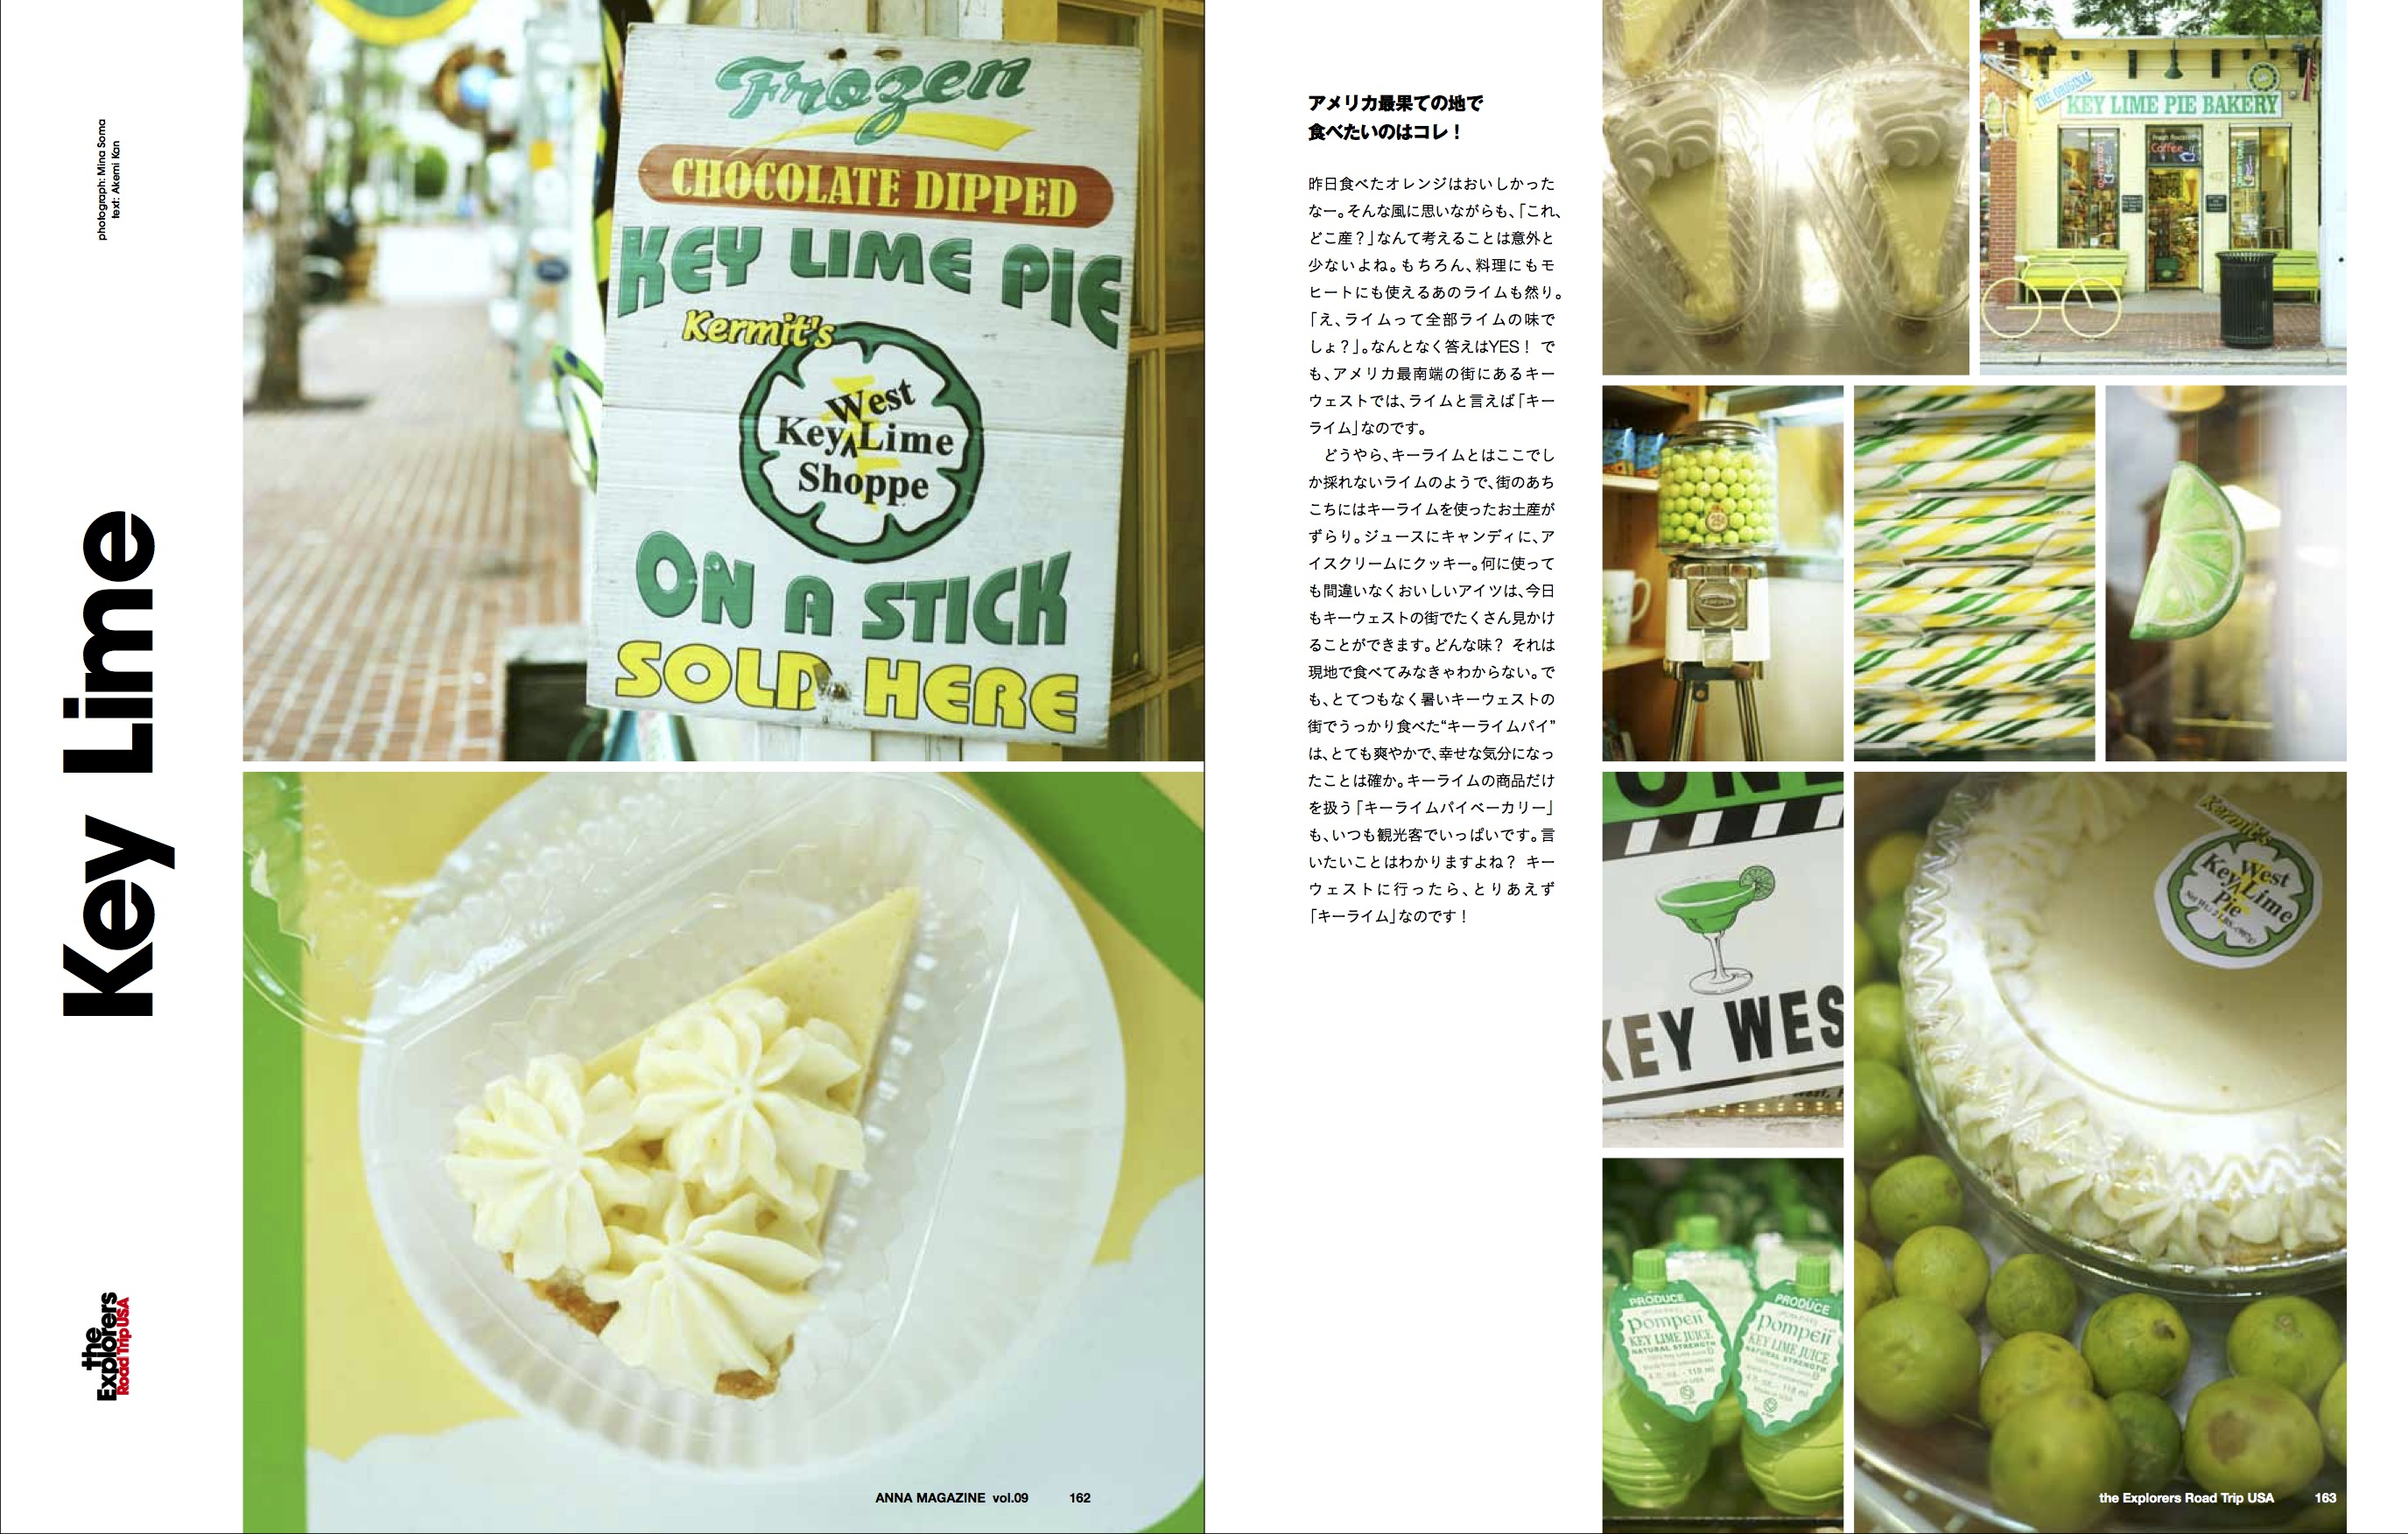 anna magazine vol.9 P81